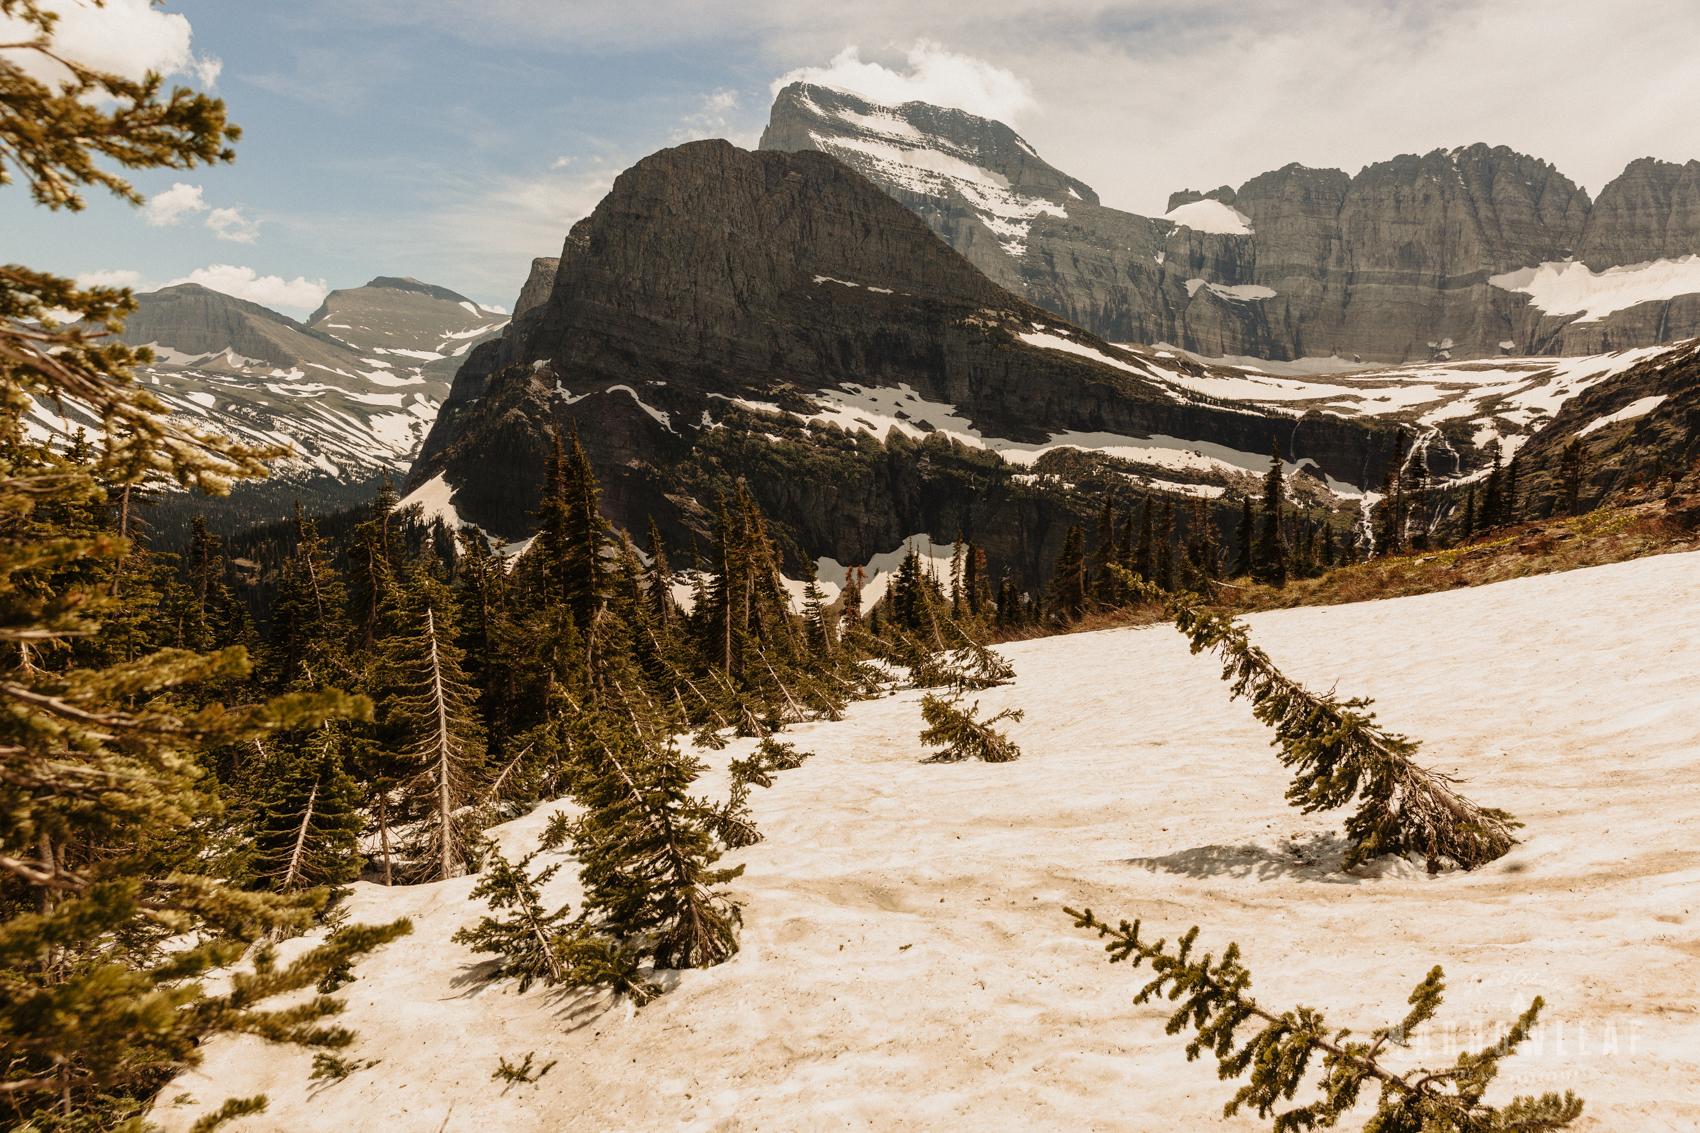 Montana-Glacier-National-Park-Many-Glacier-Narrowleaf-Love-and-Adventure-elopement-Photography-9661.jpg